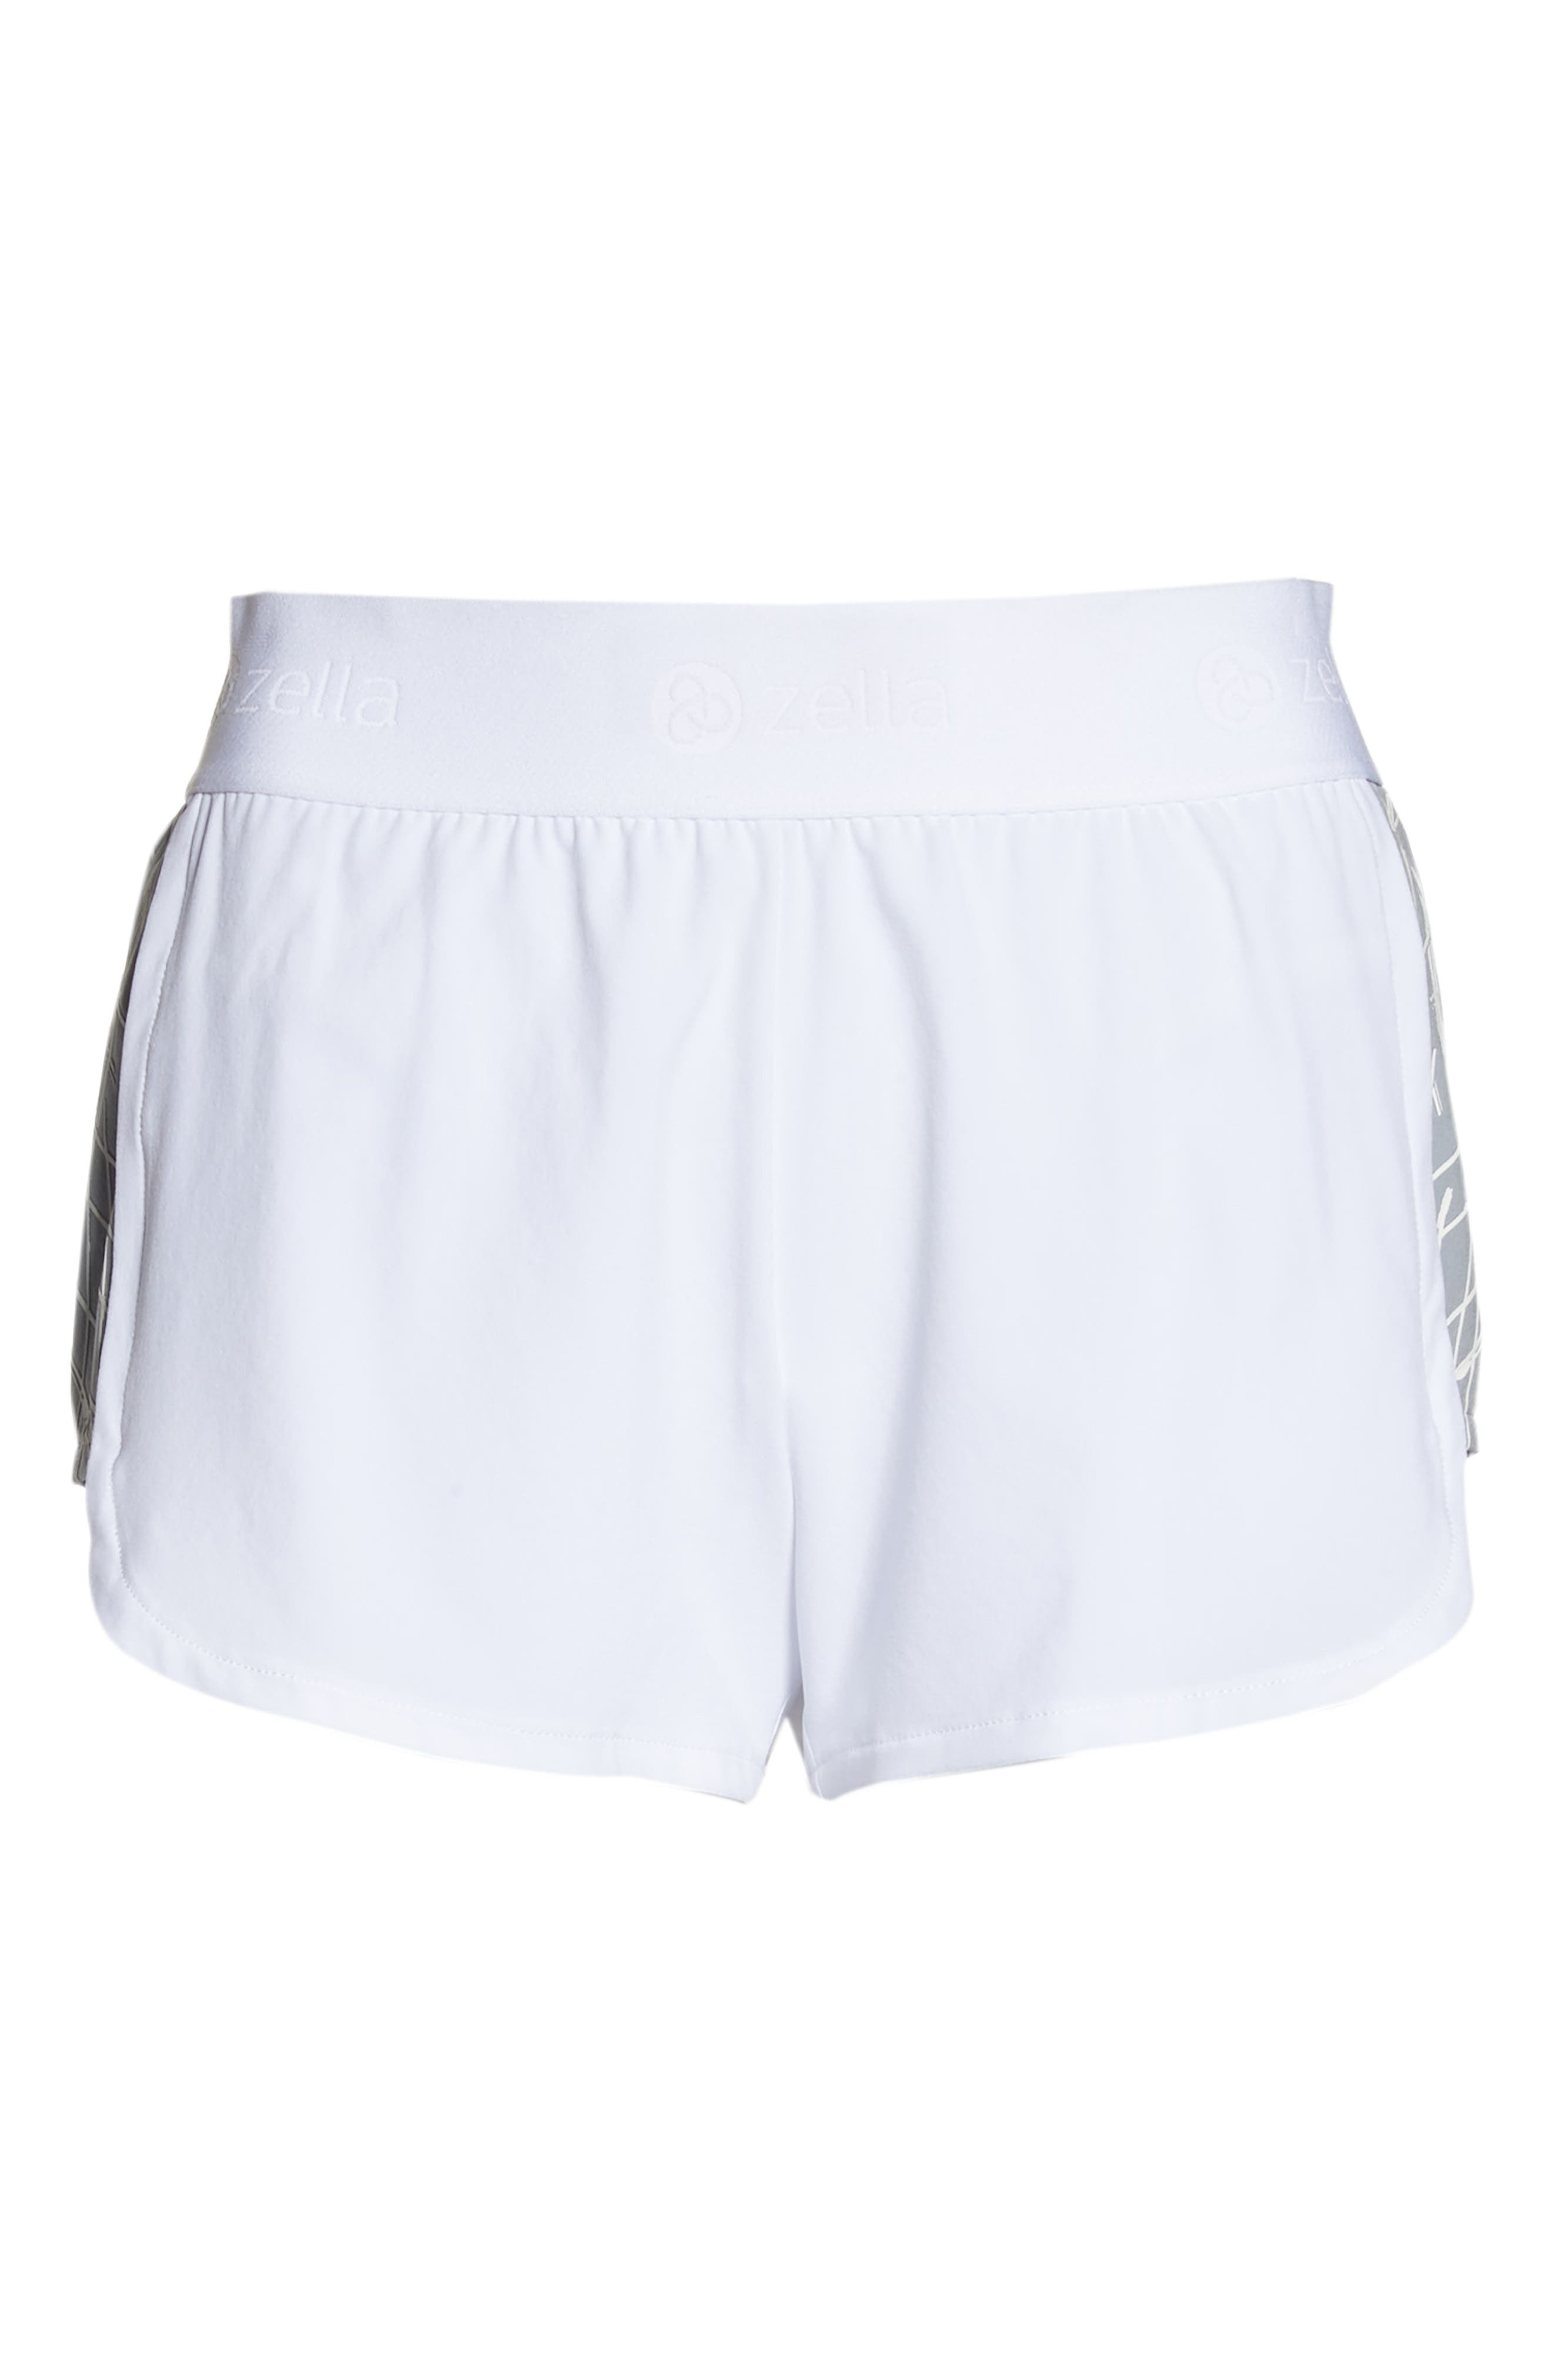 Go Run Reflect Shorts,                             Alternate thumbnail 7, color,                             WHITE